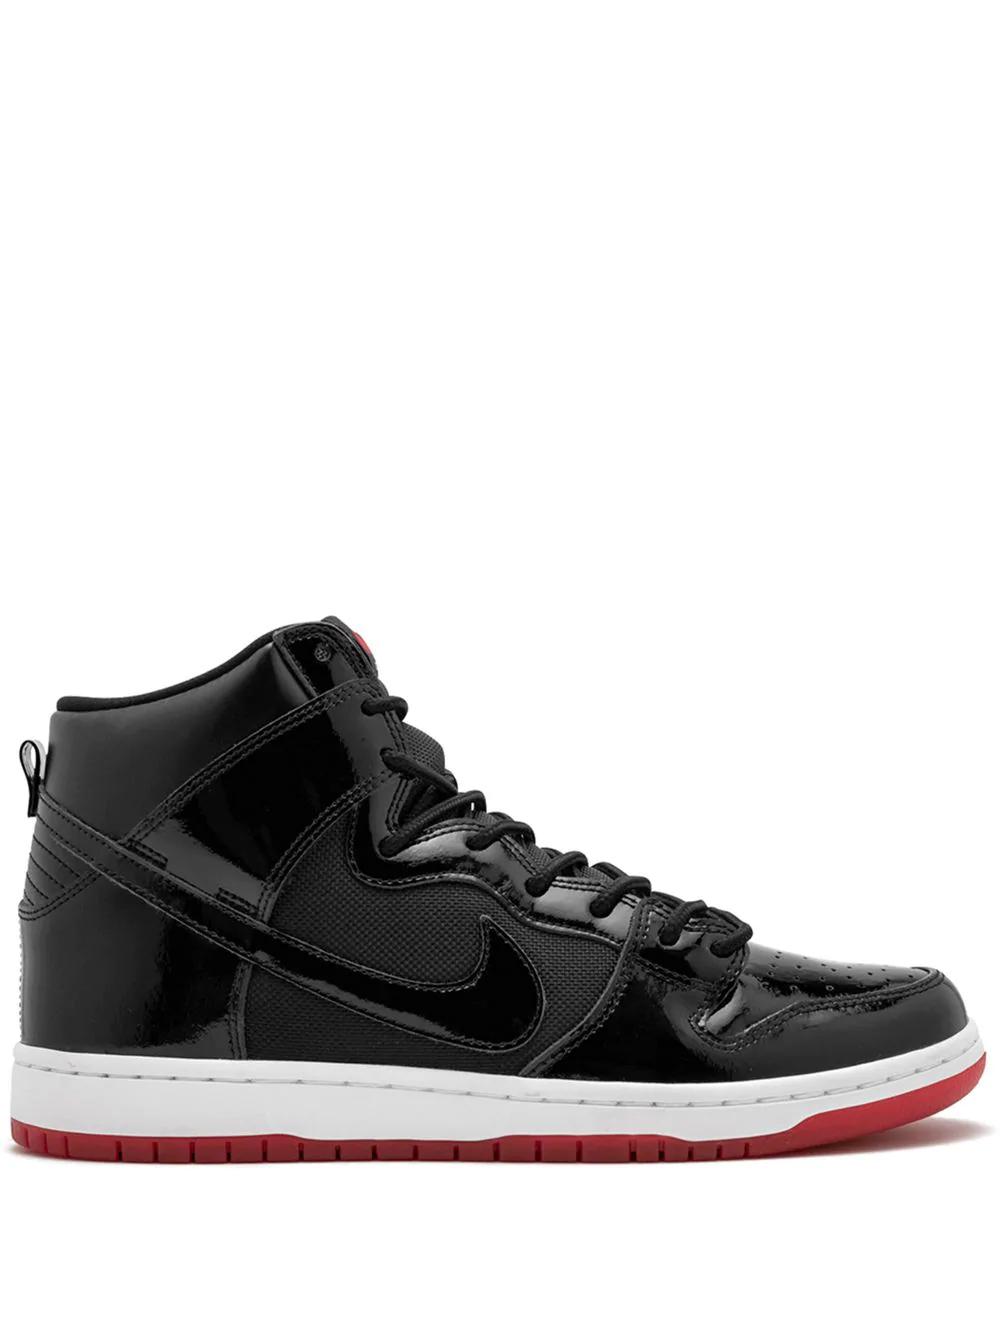 dede82948302d5 Nike Sb Zoom Dunk High Tr Qs - Black